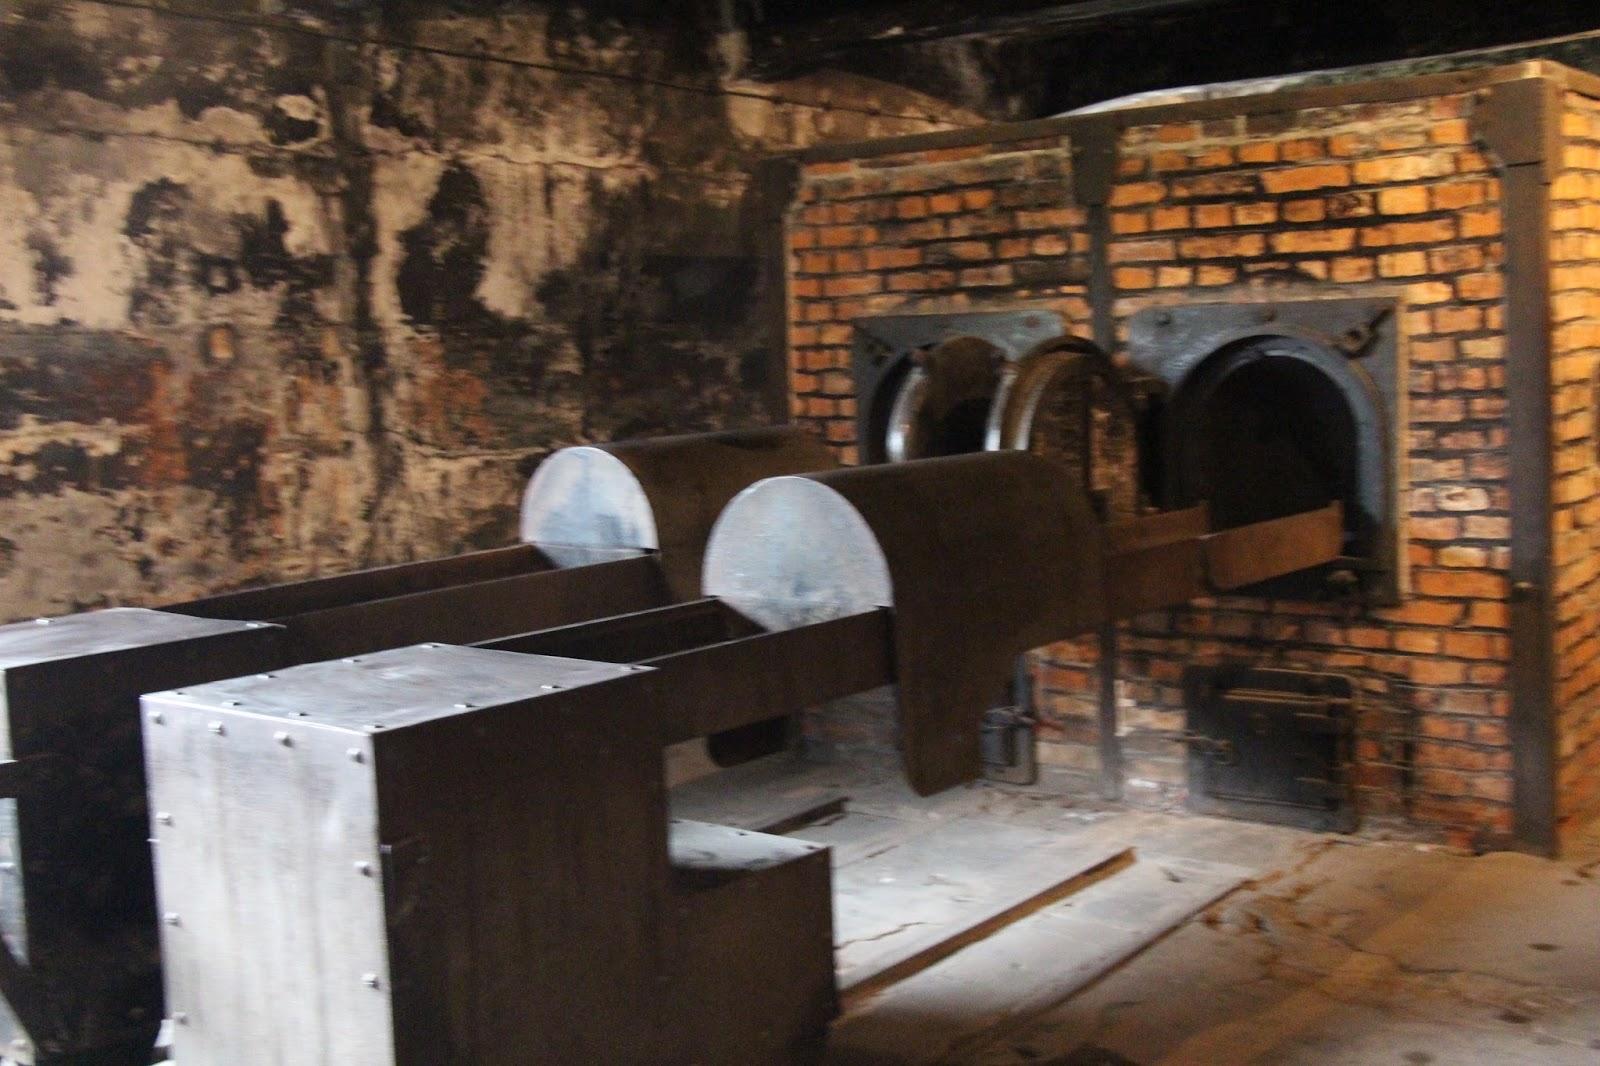 Holocaust Study Tour: Day 10 - Auschwitz